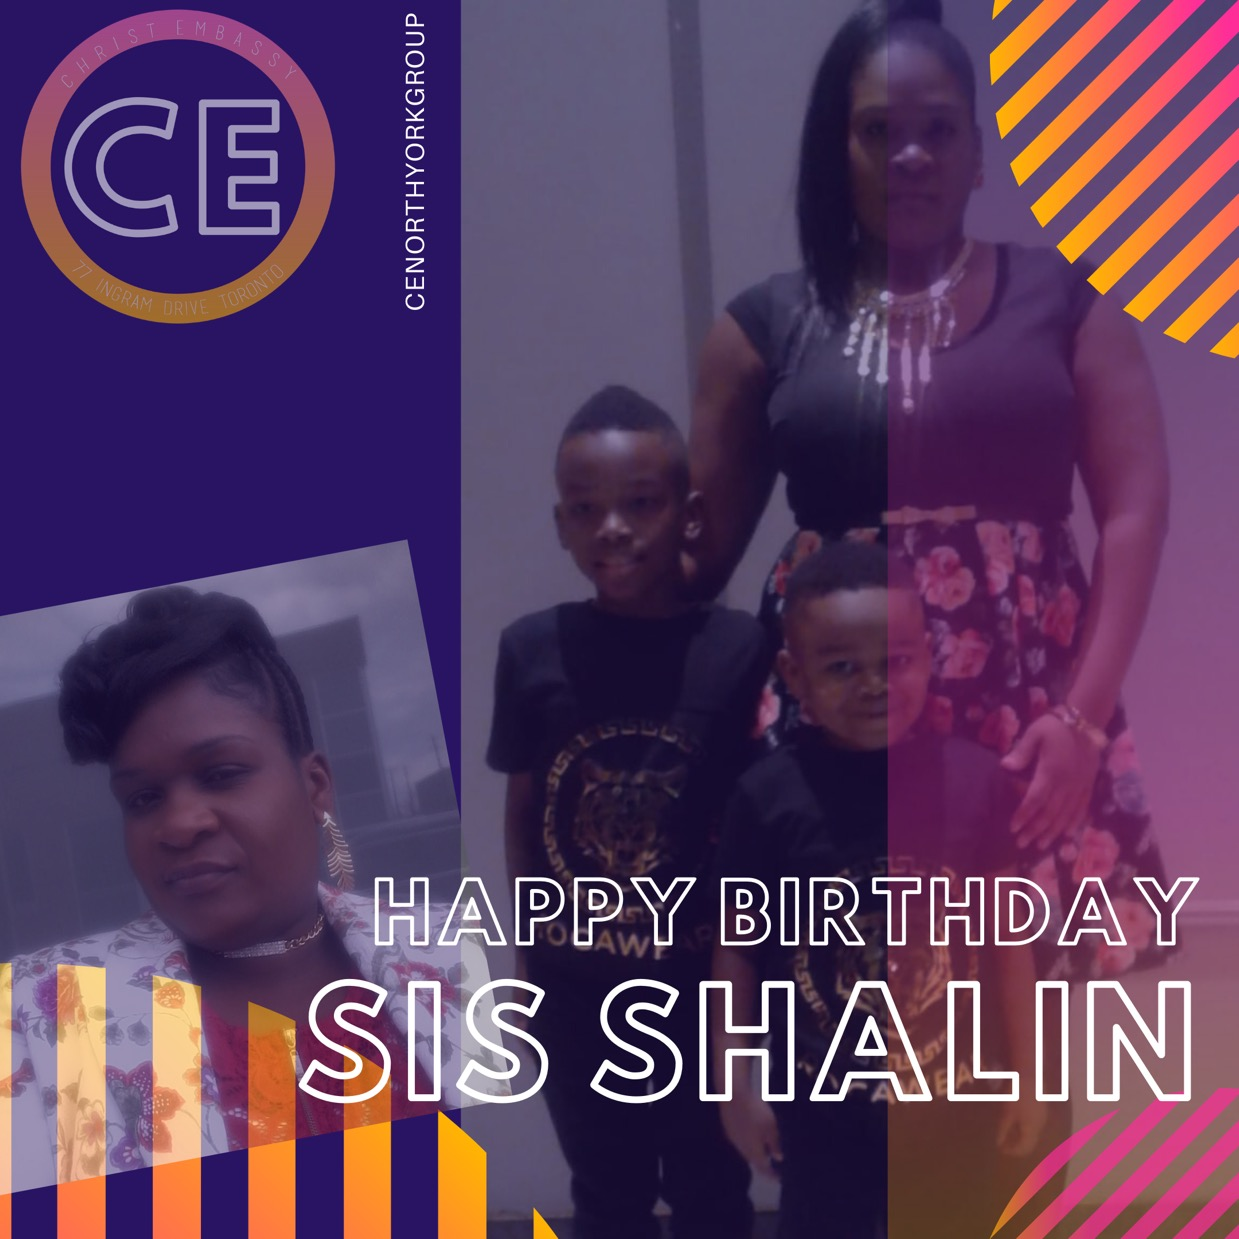 Happy Birthday Dearest Sis Shalin.